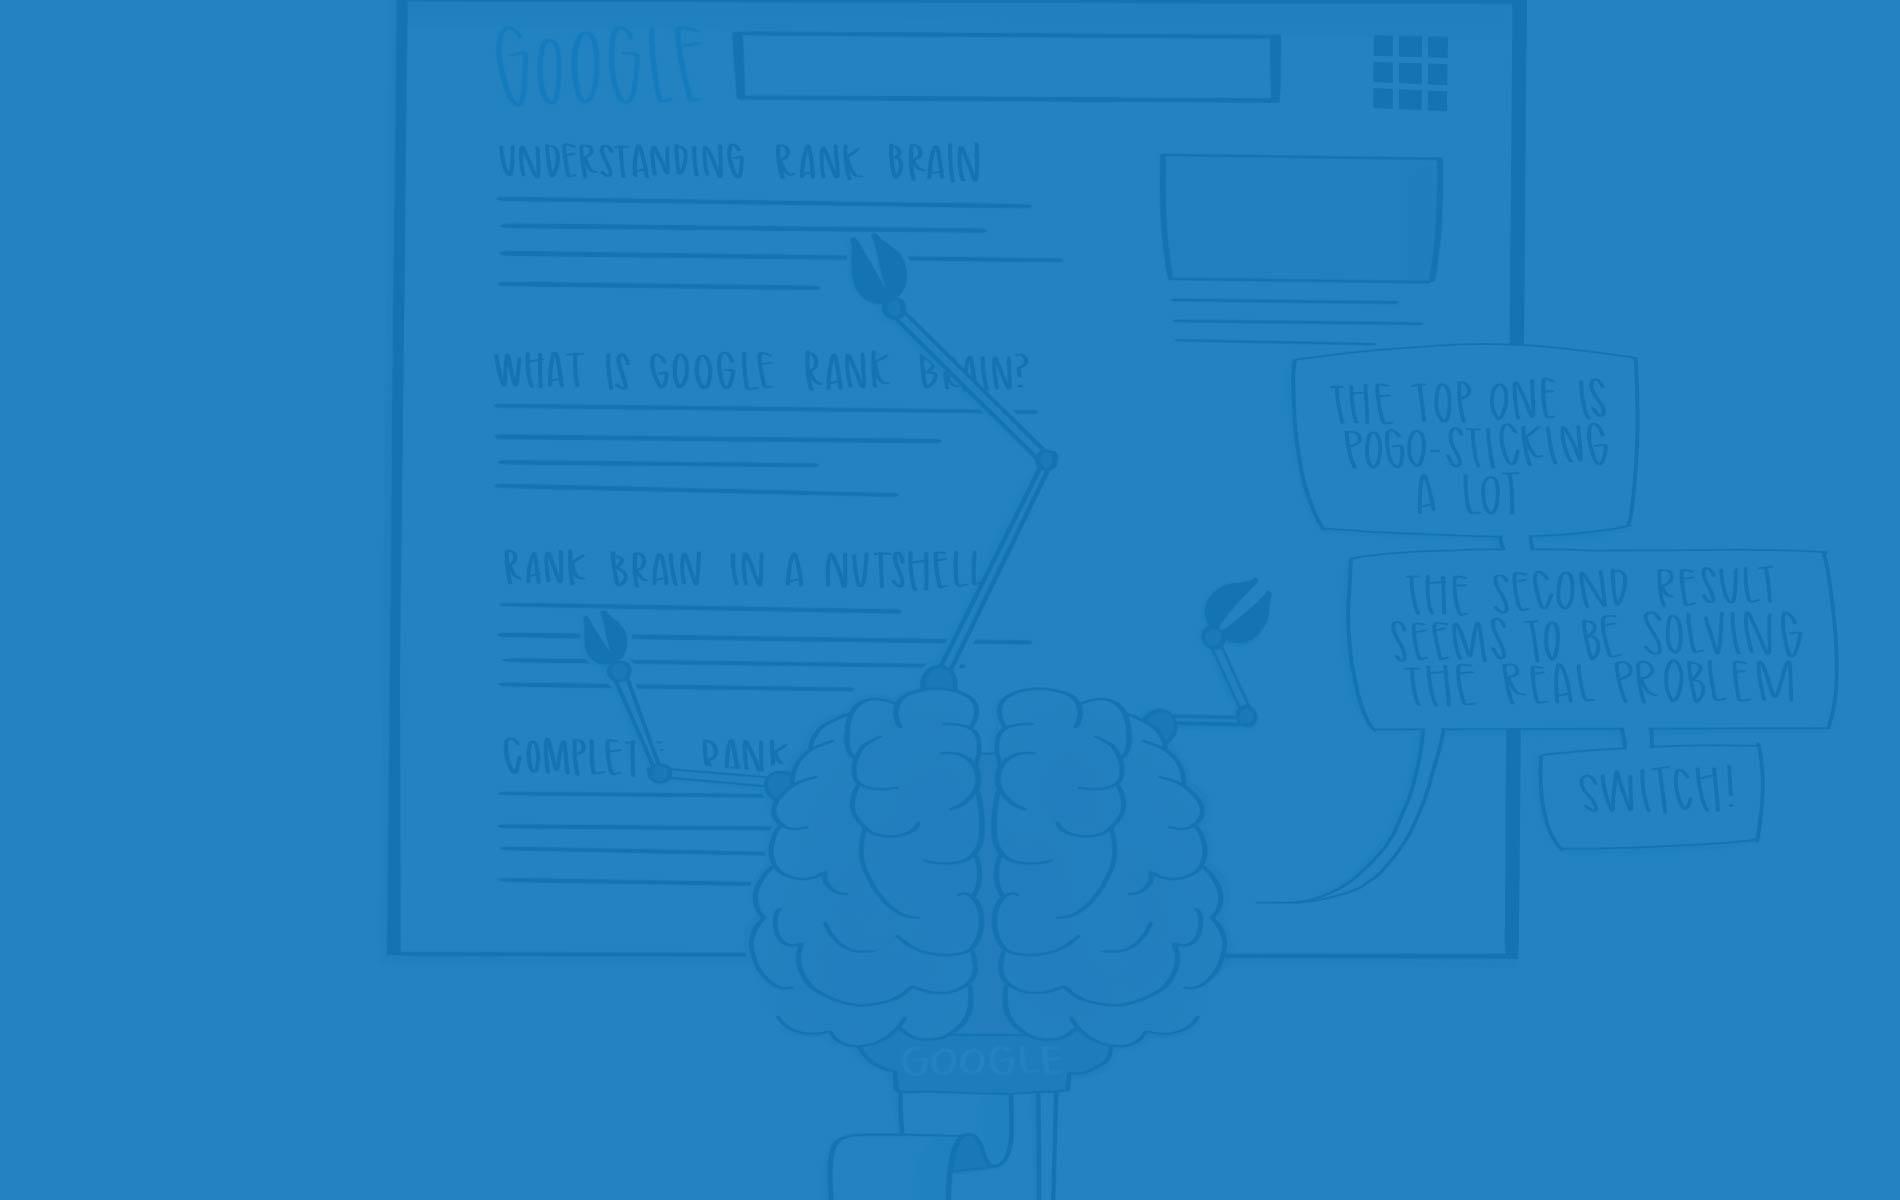 What is Google Rank Brain?